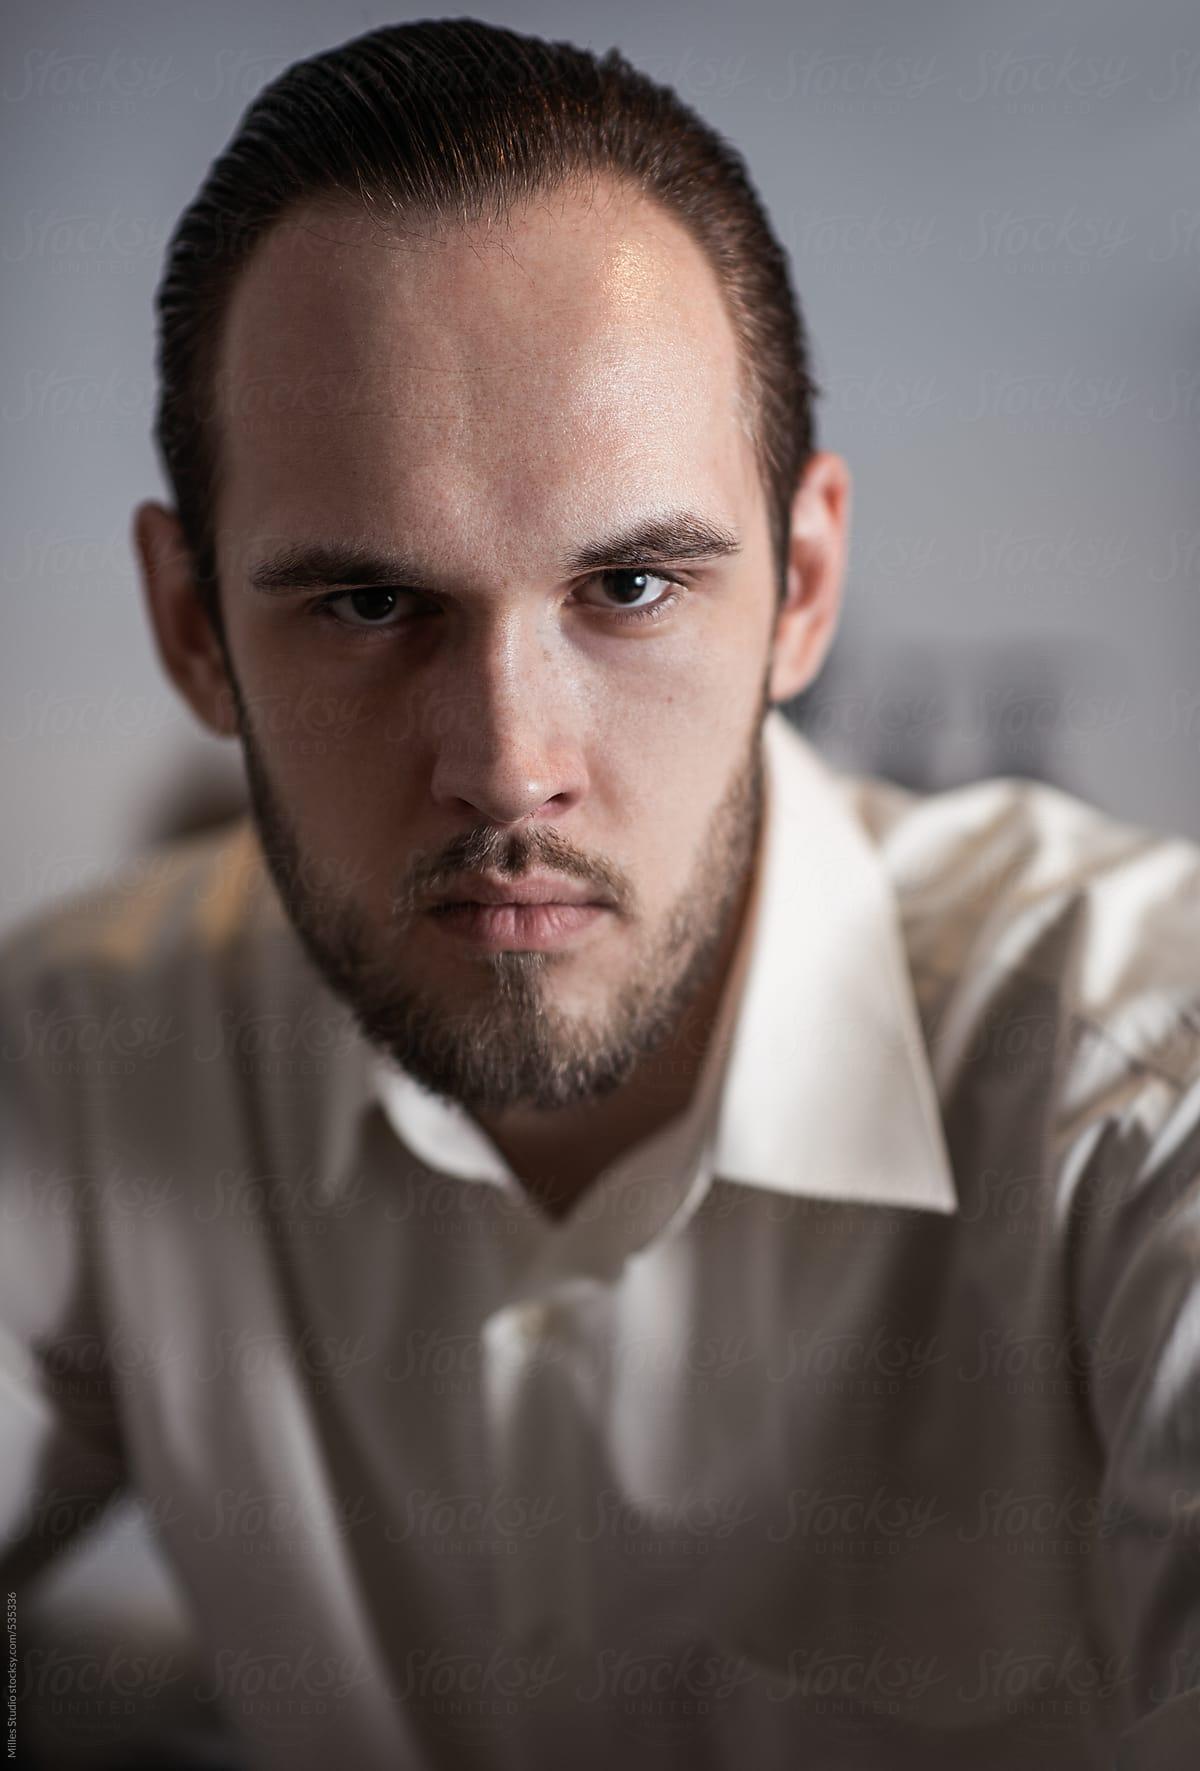 45 pictures proving beards make men irresistibly handsome